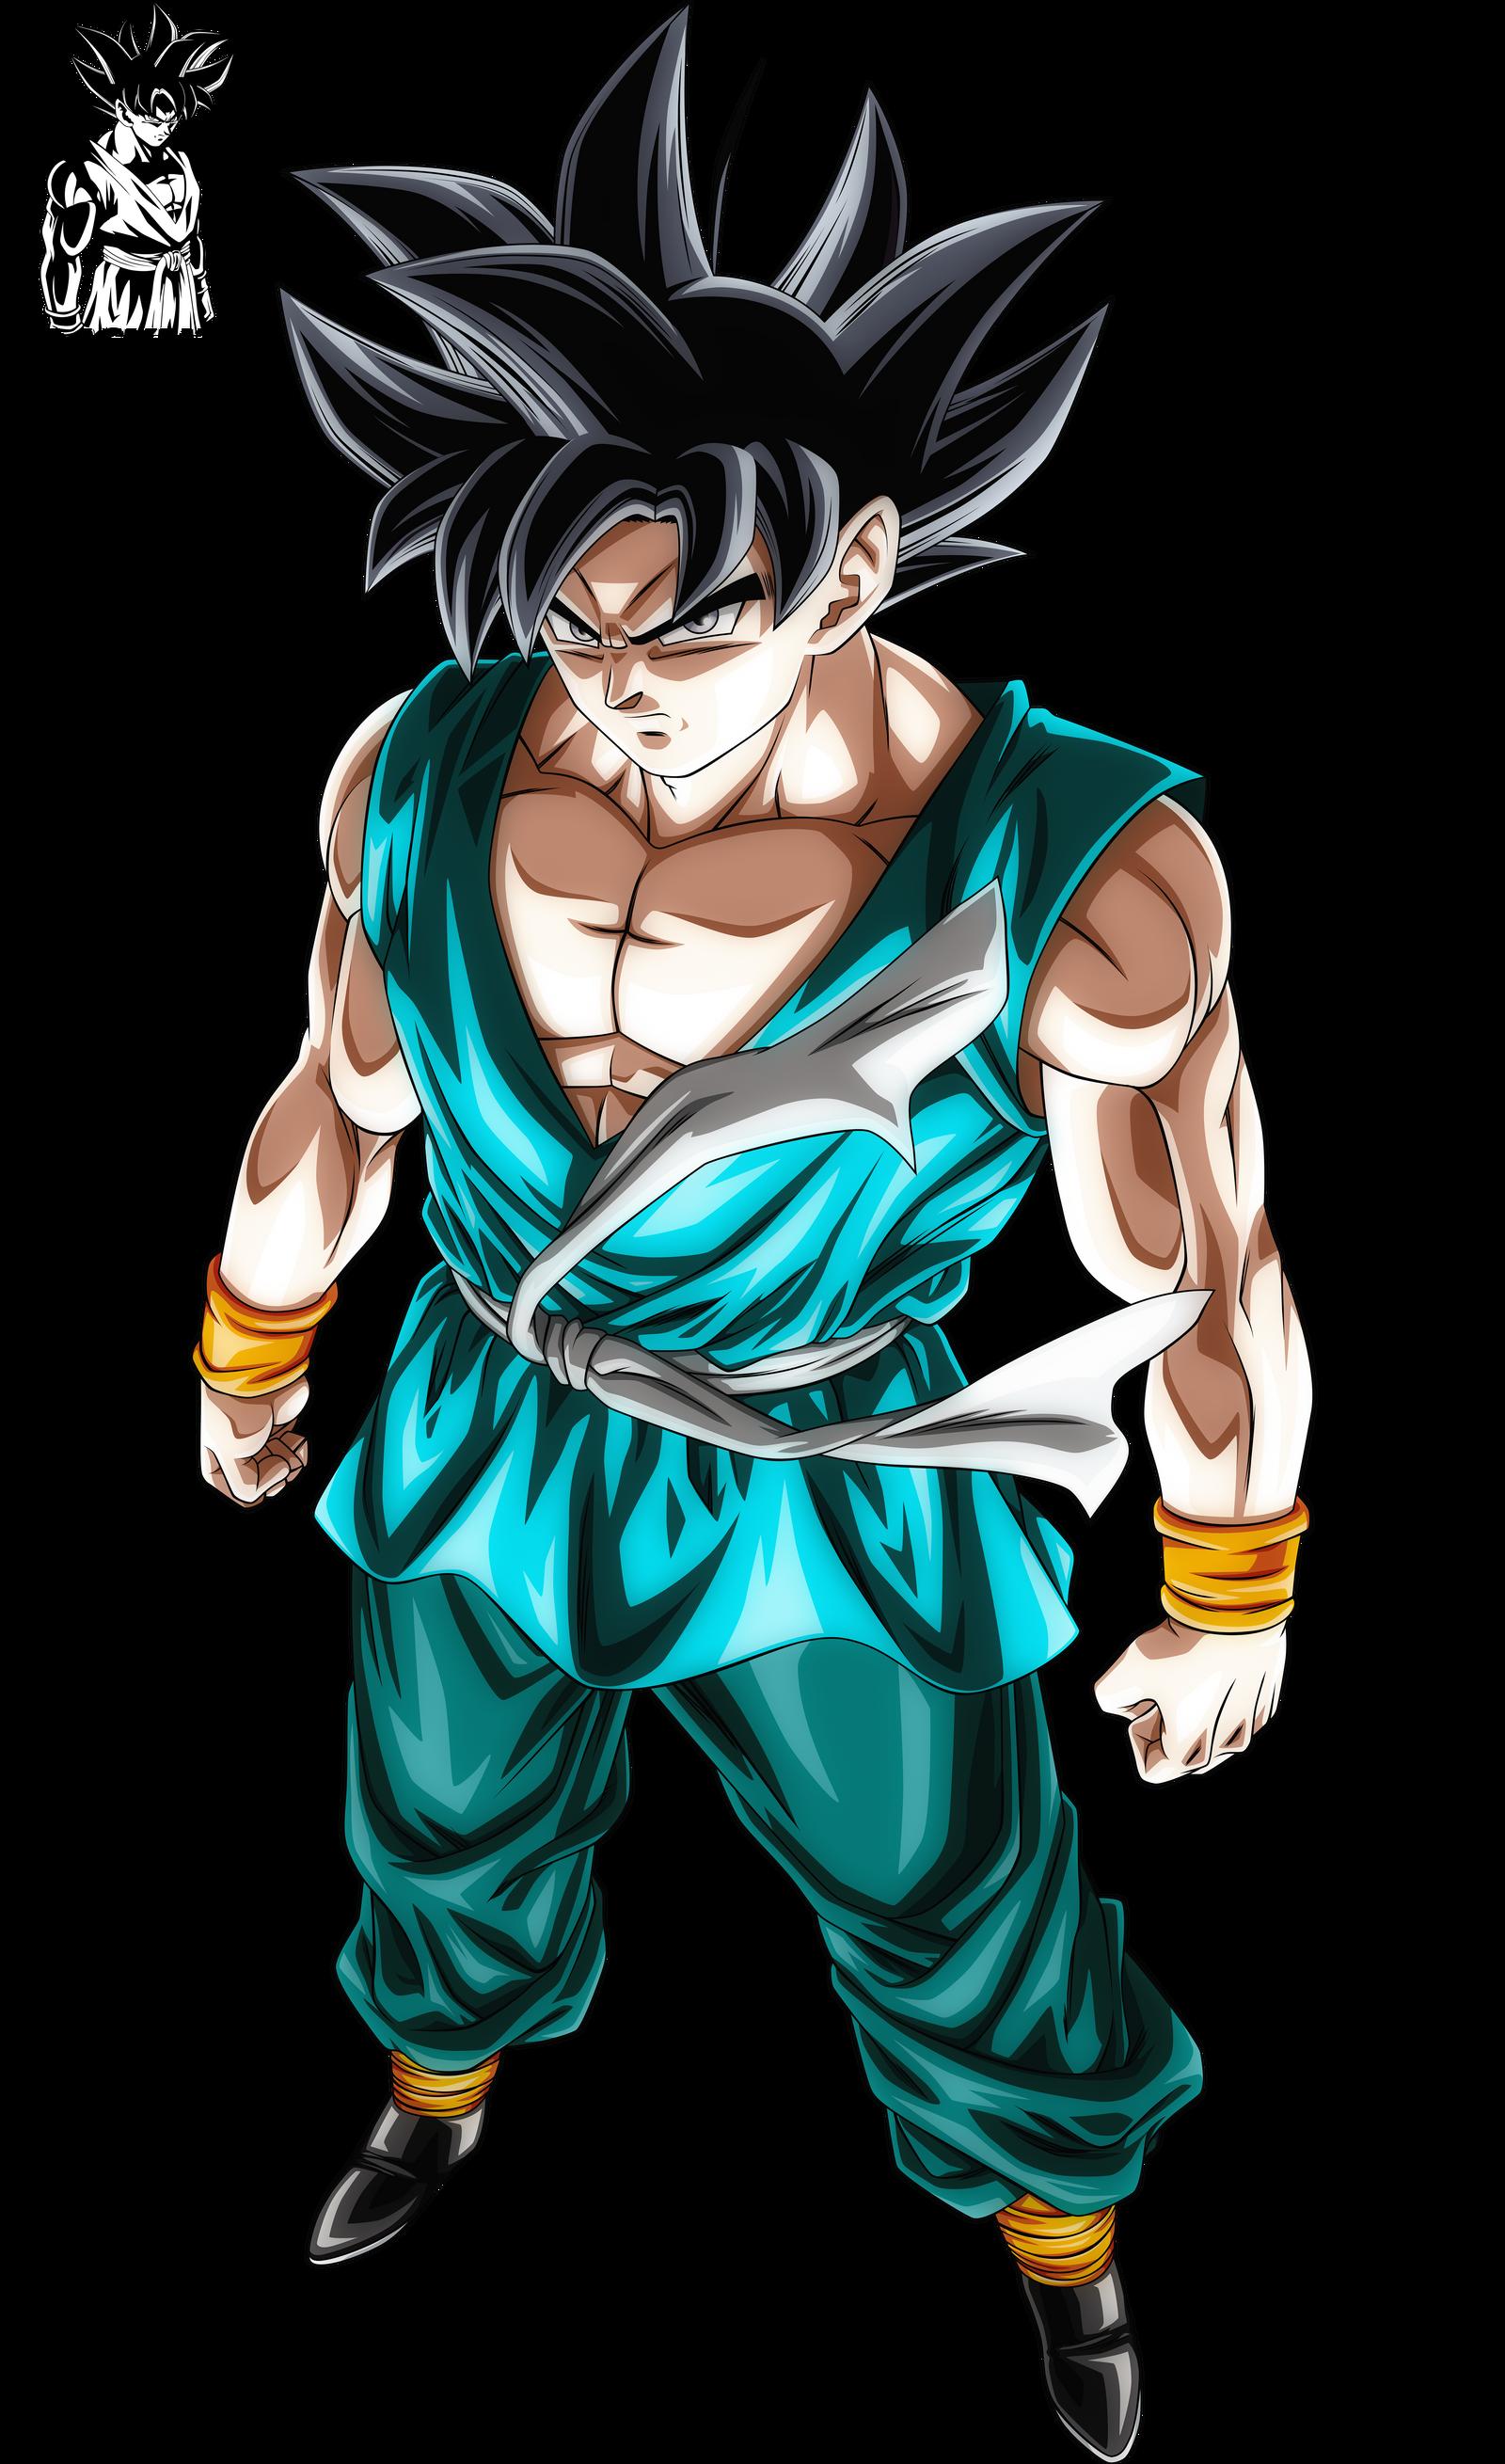 Son Goku Ultra Instinct Omen By Ajckh2 On Deviantart Anime Dragon Ball Super Dragon Ball Super Goku Goku Ultra Instinct